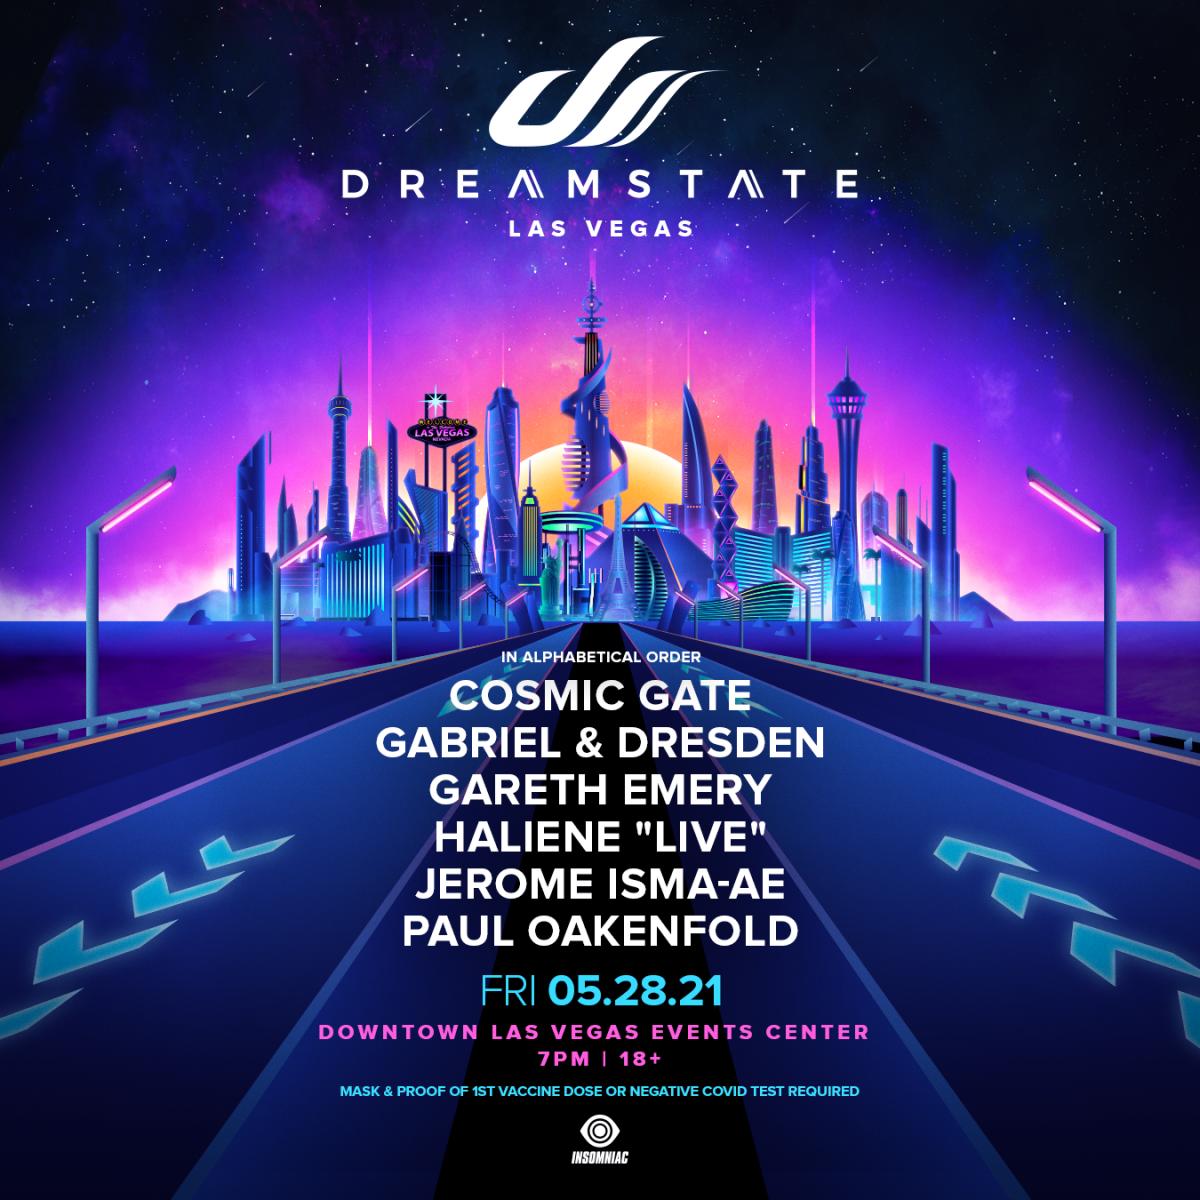 Dreamstate Las Vegas